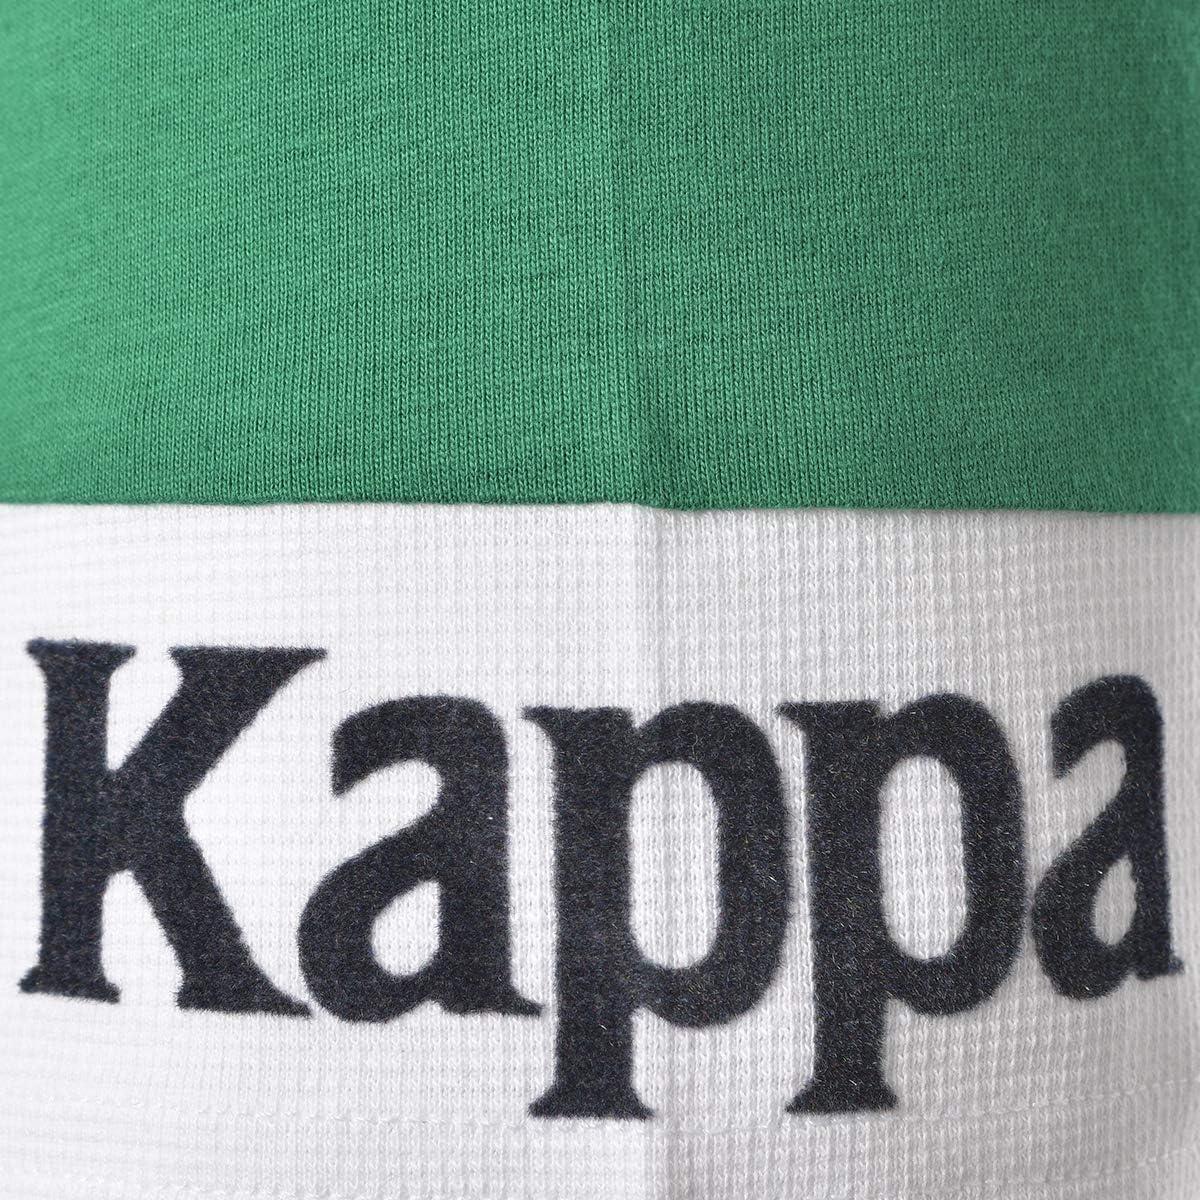 Kappa Isiah Camiseta Manga Corta Hombre